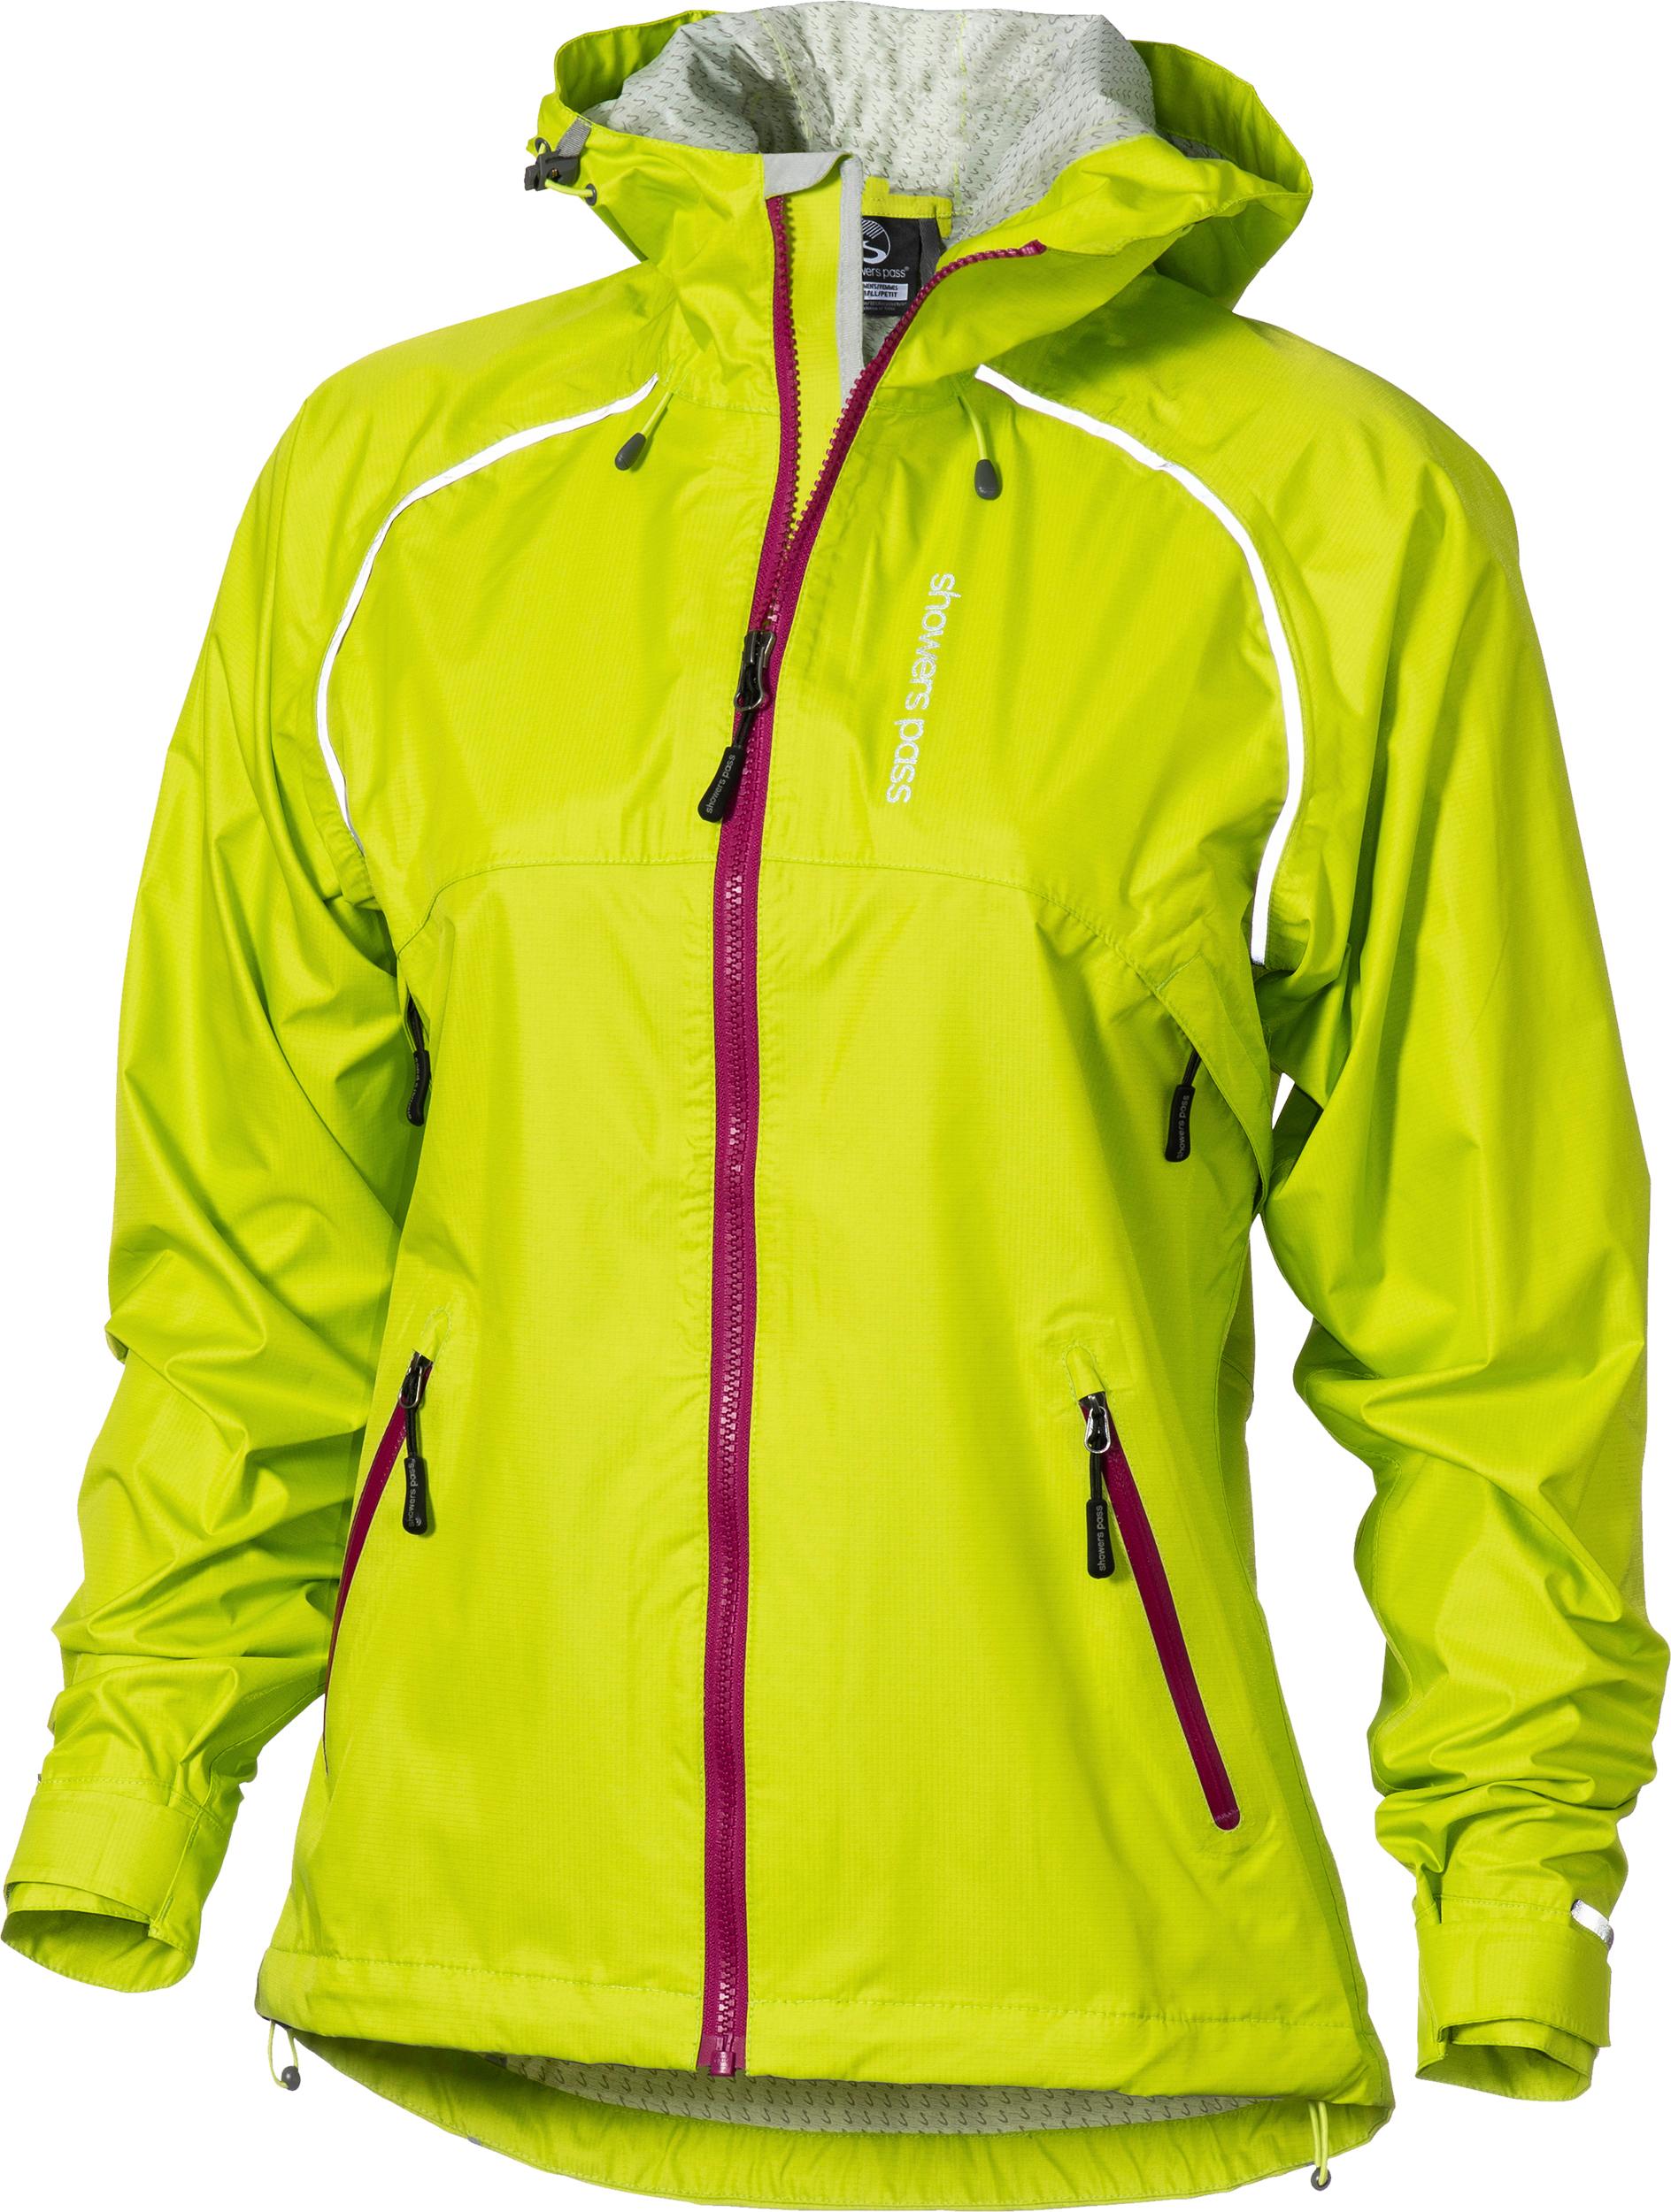 Piu Miglia Waterproof Womens Cycling Jacket Yellow Lightweight Reflective Cycle